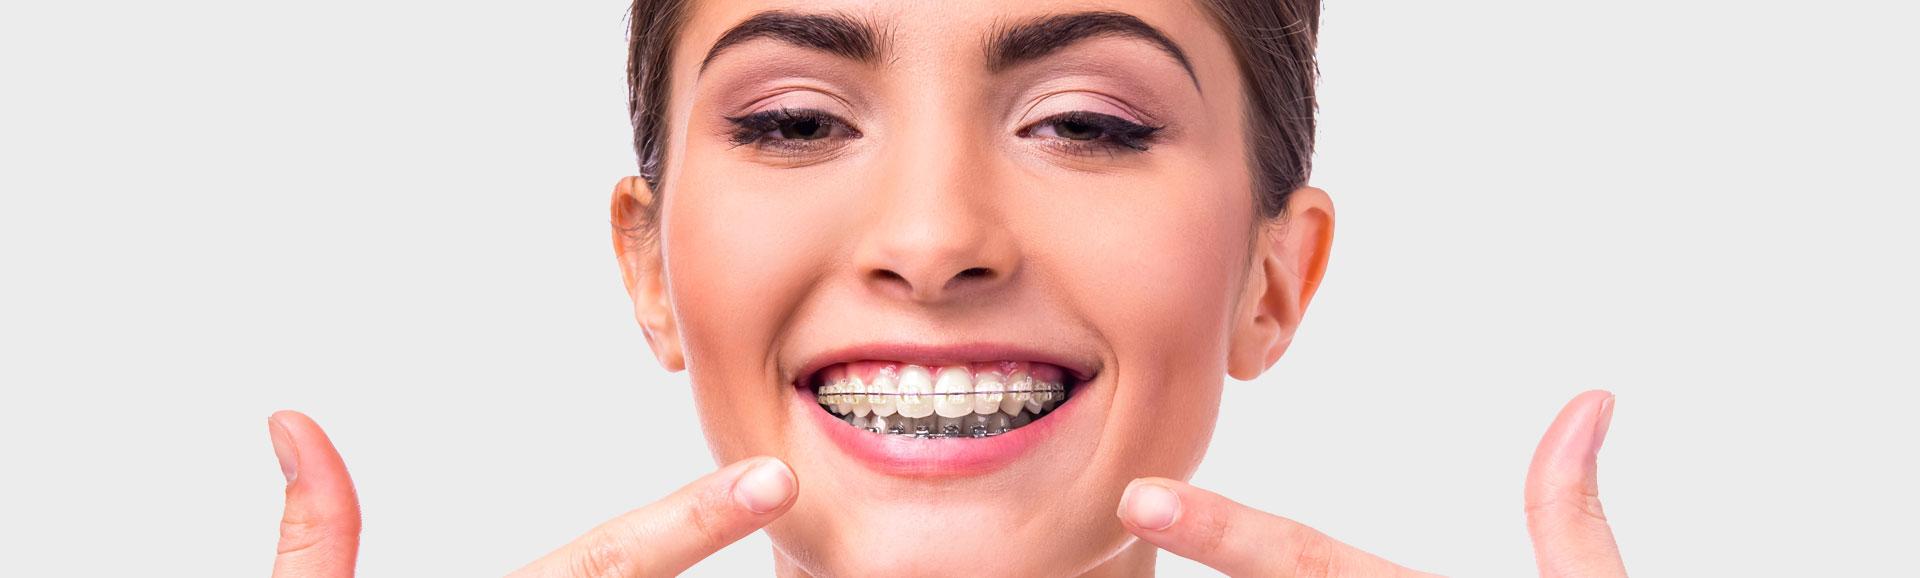 Woman with dental brace